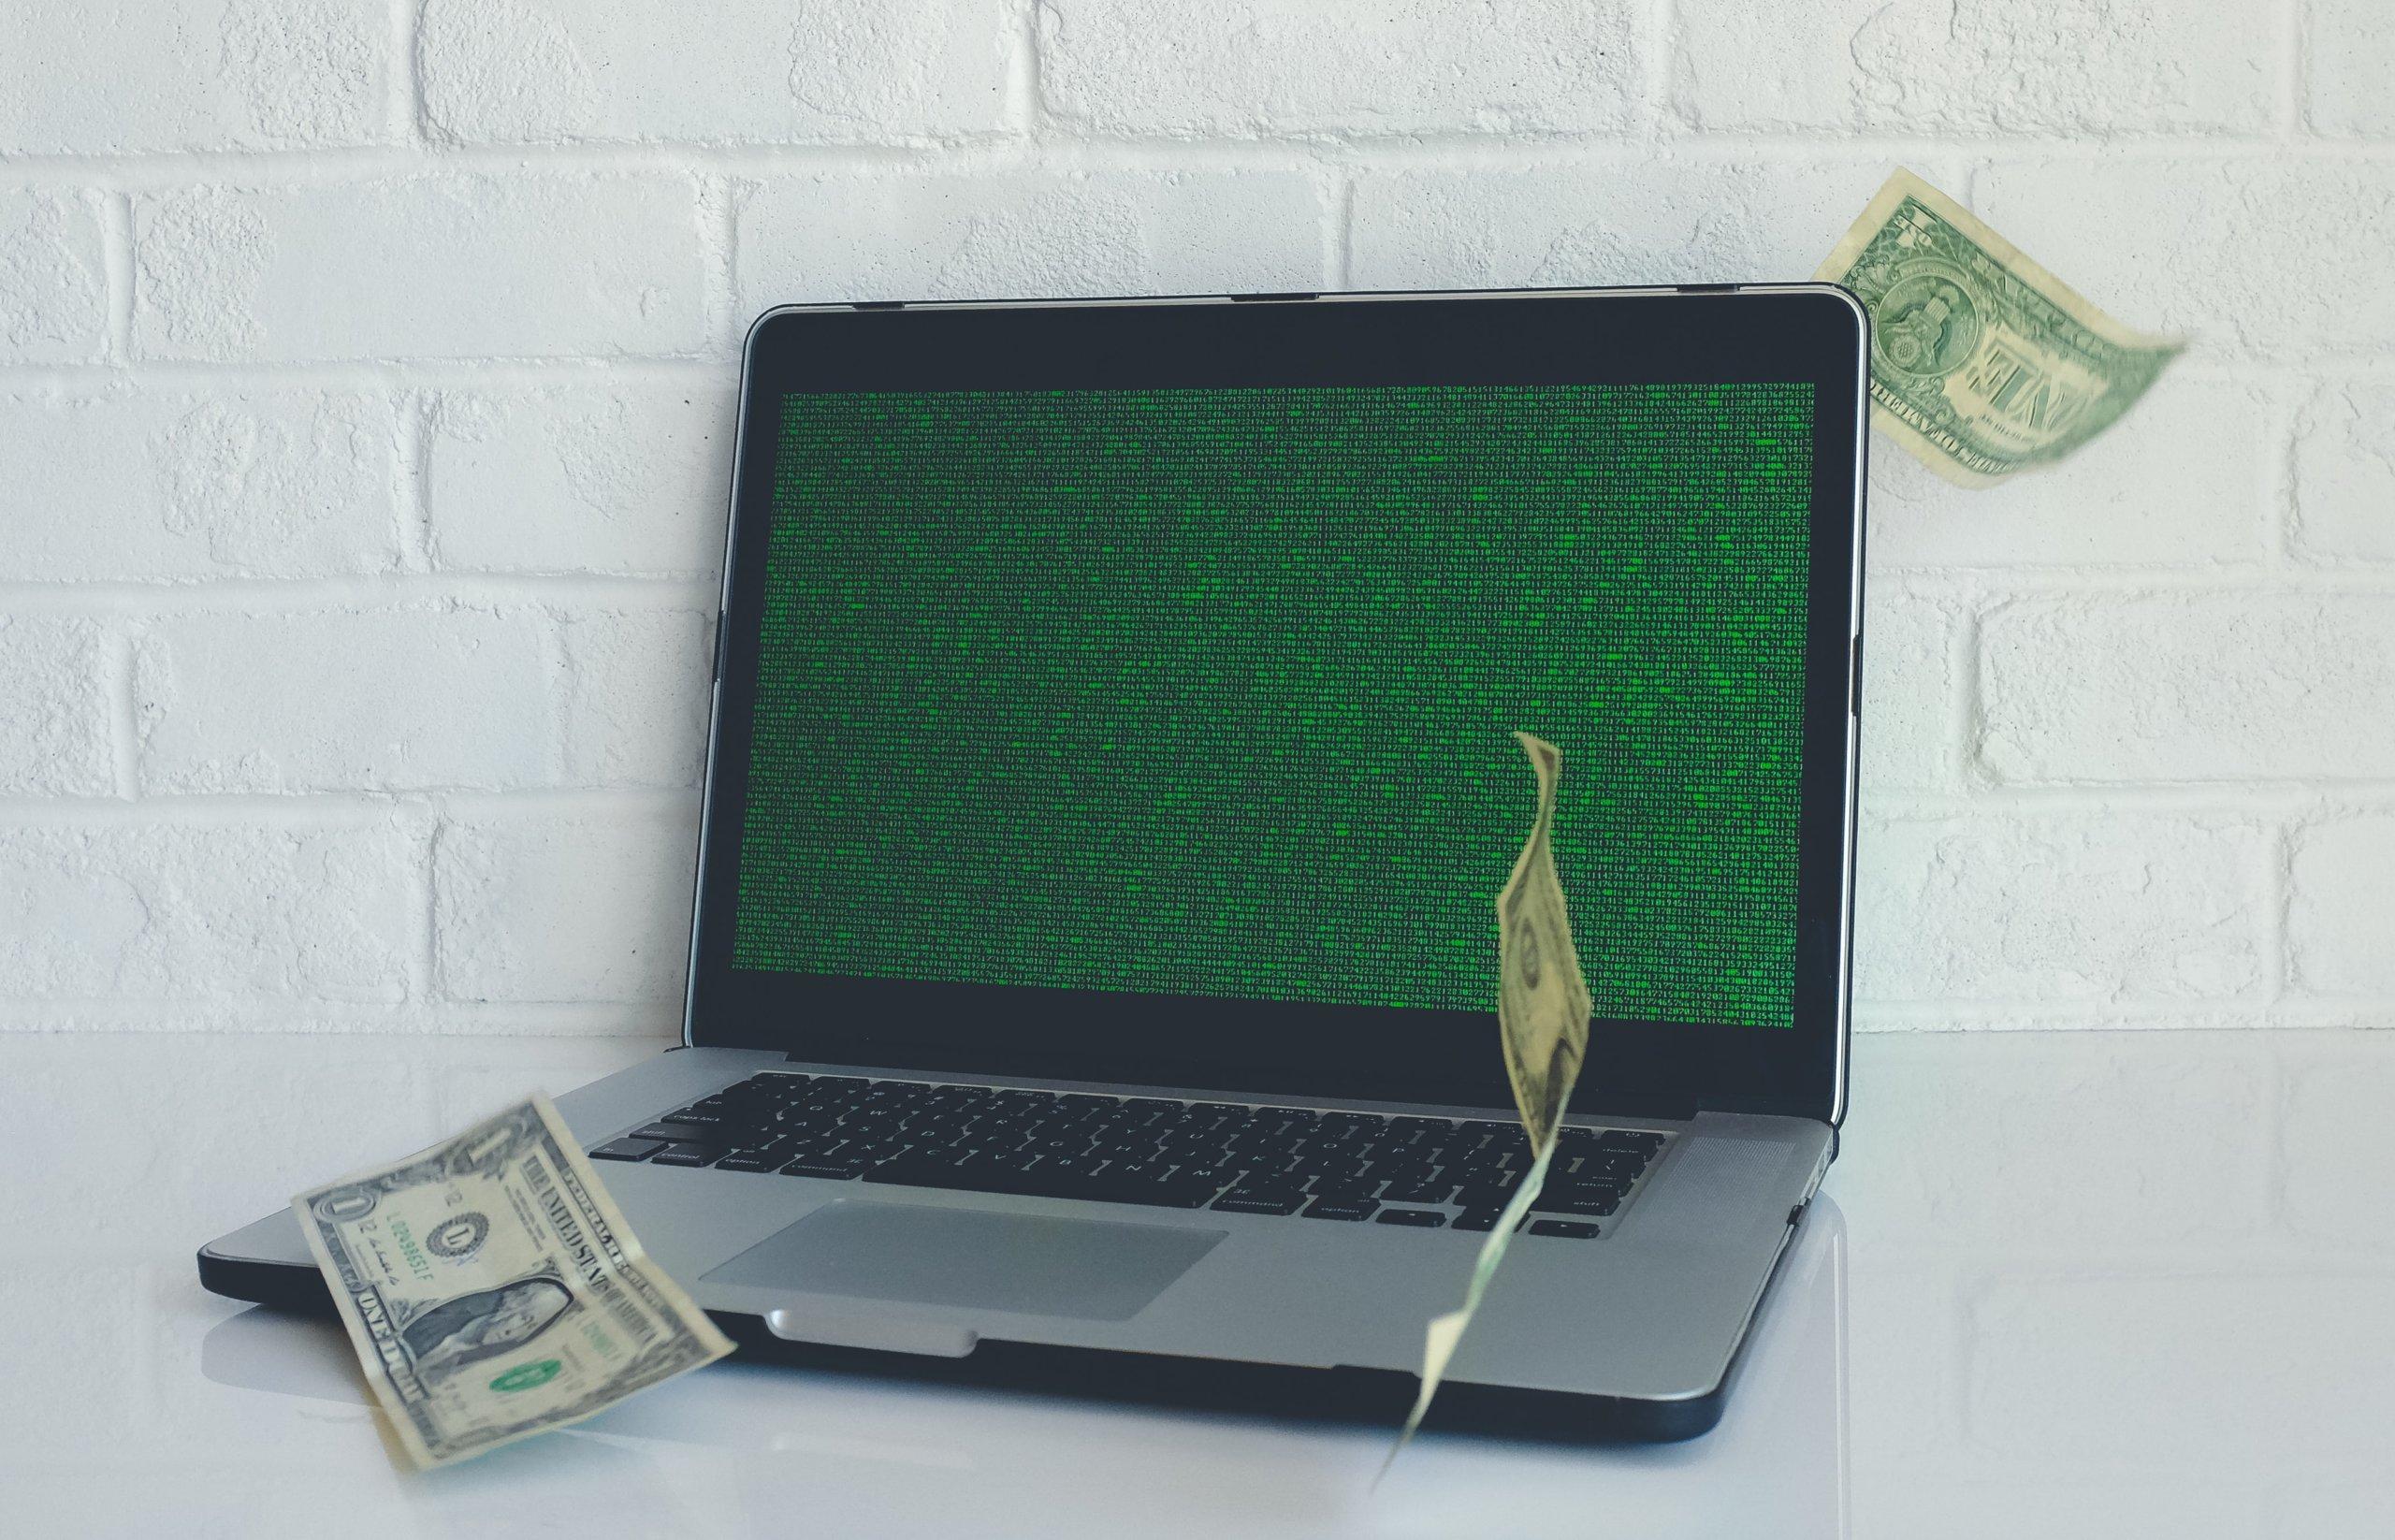 Cash on Laptop